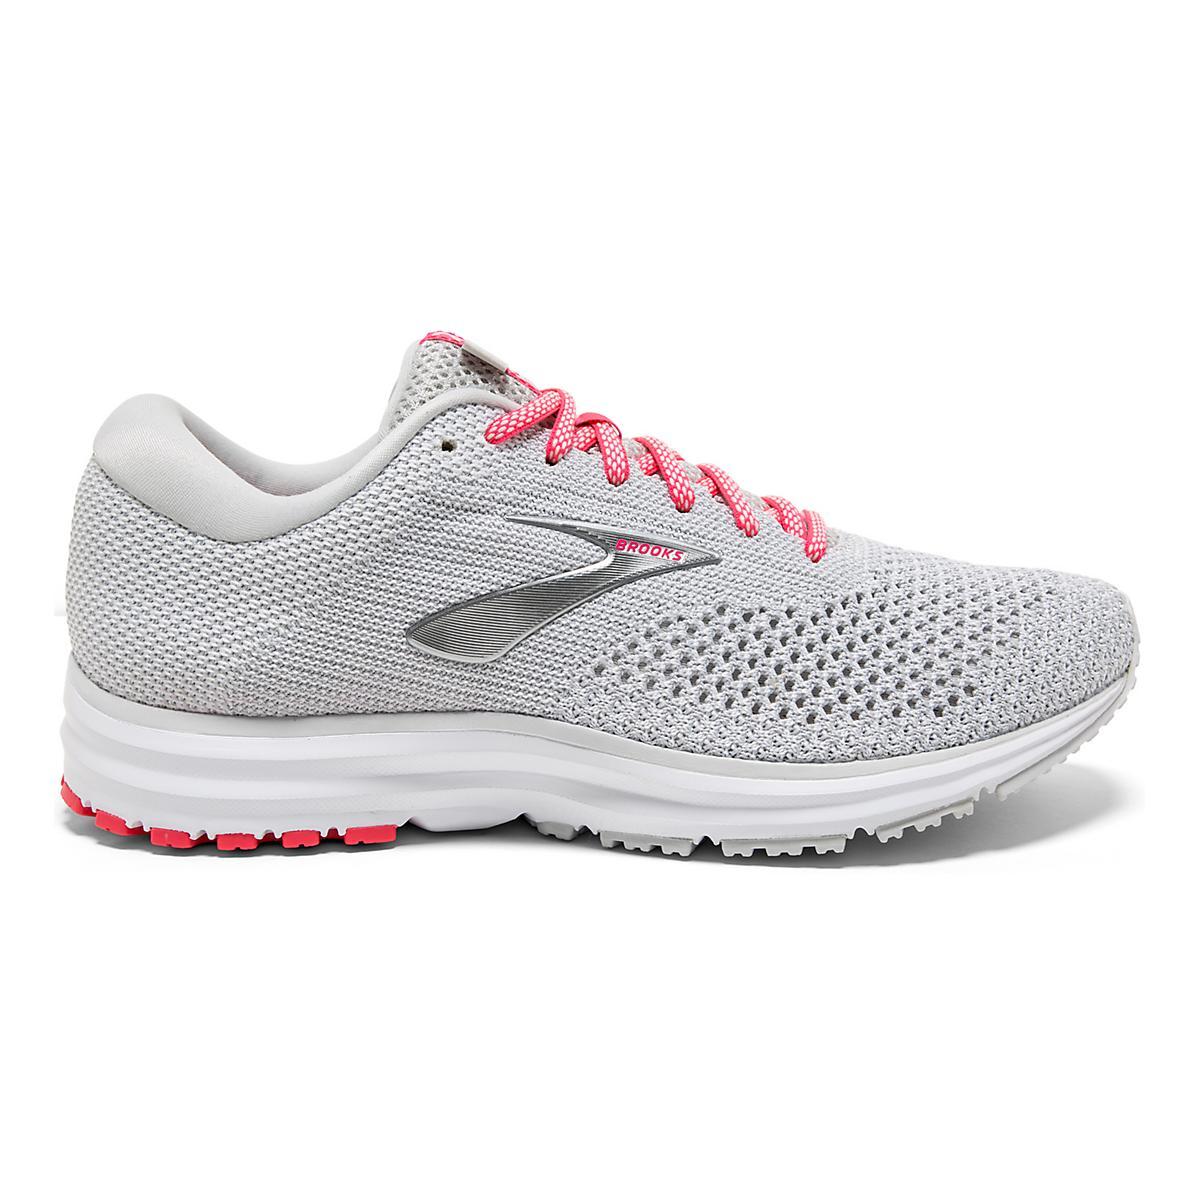 8c20dd35541 Womens Brooks Revel 2 Running Shoe at Road Runner Sports